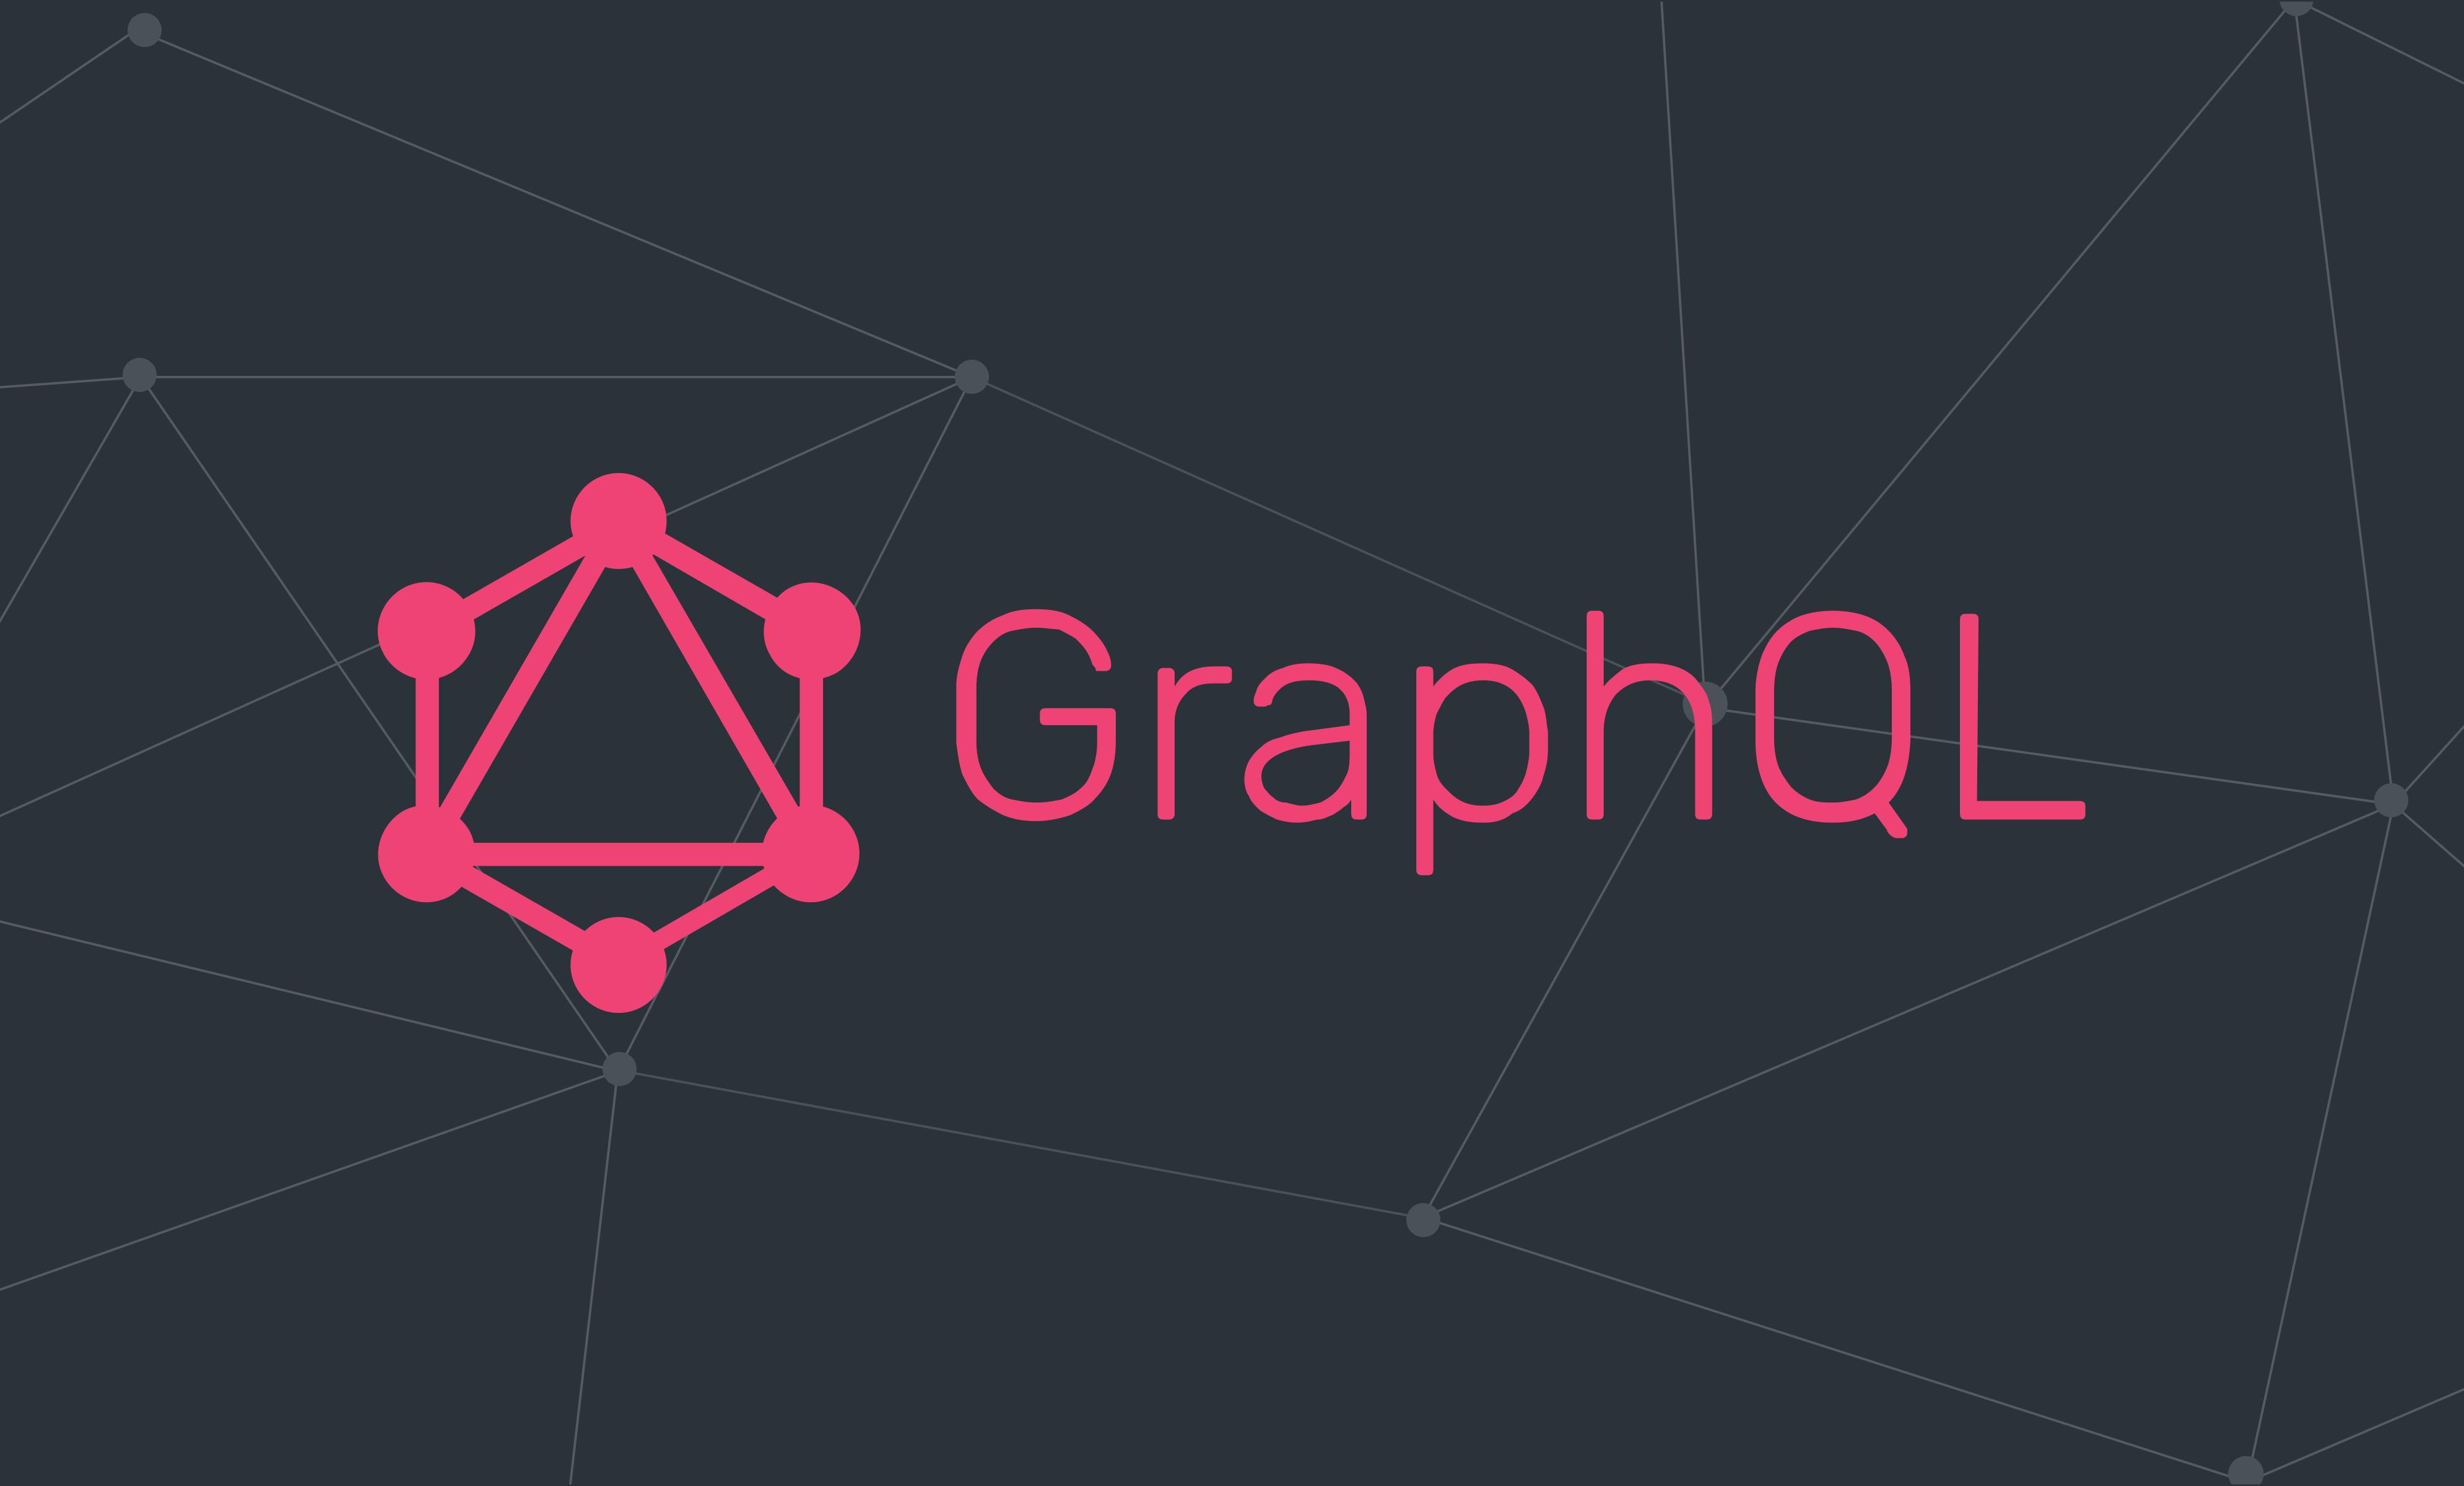 5 Reasons to use GraphQL at Your Company